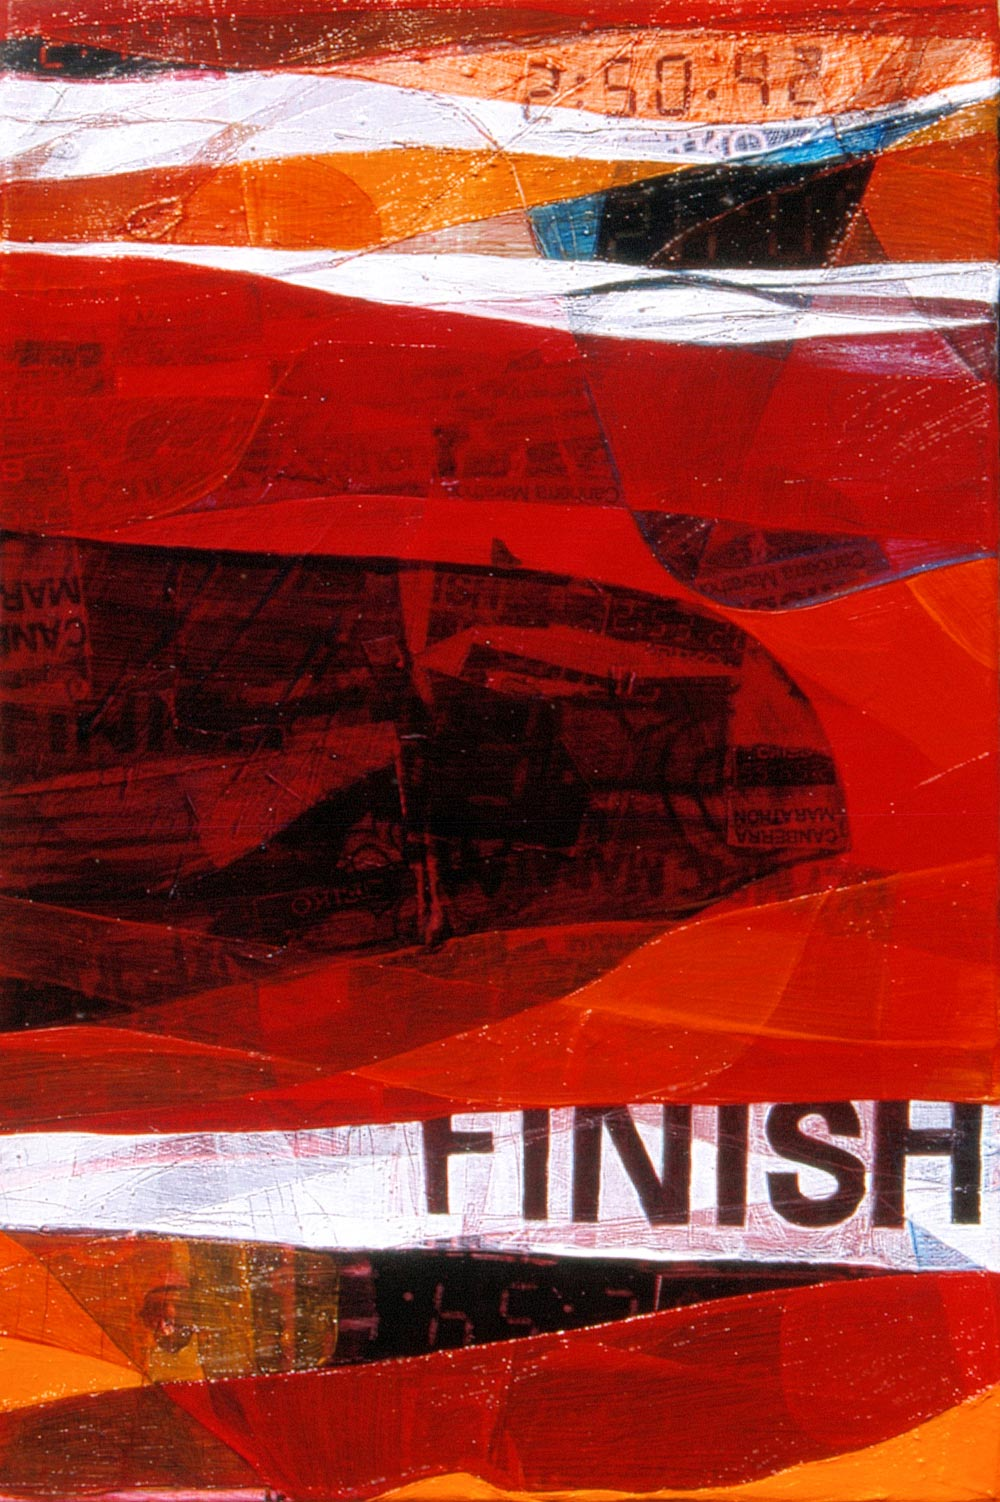 Finish (02:50.42)